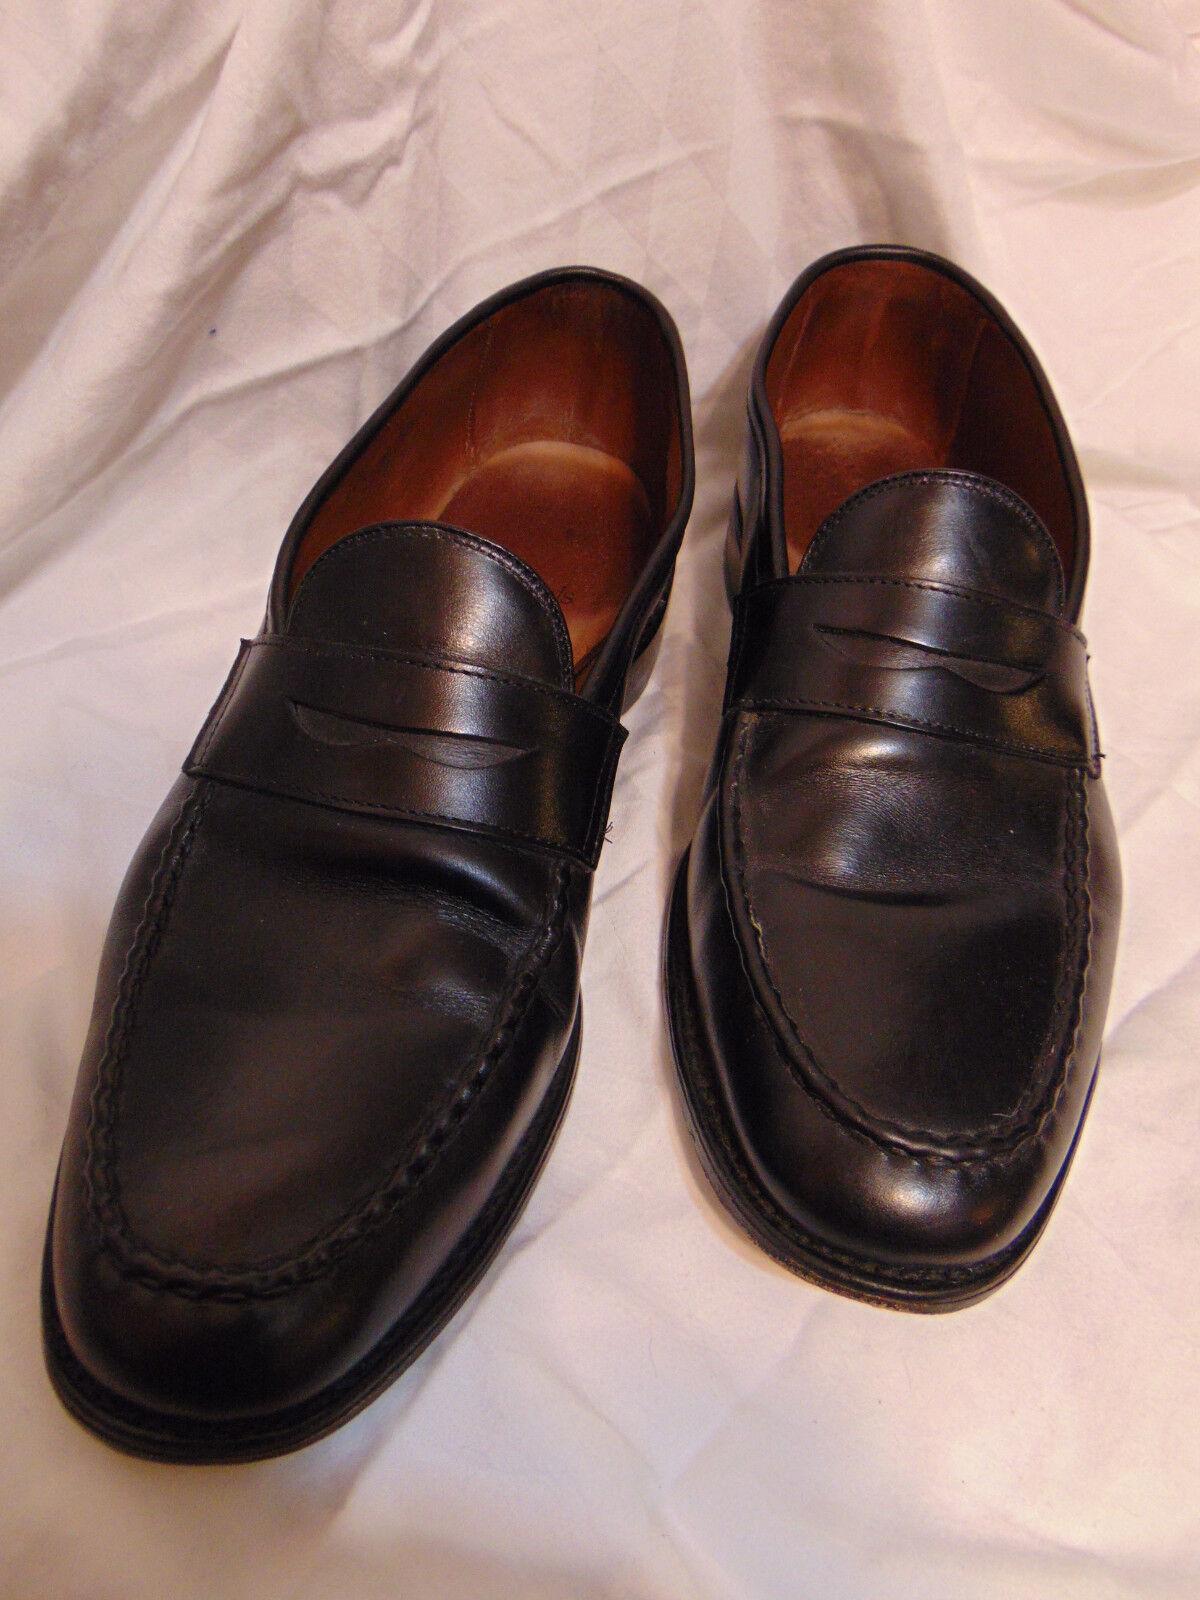 Allen Edmonds McGraw Homme Penny Mocassins Style Chaussures 10.5 D en cuir noir USA